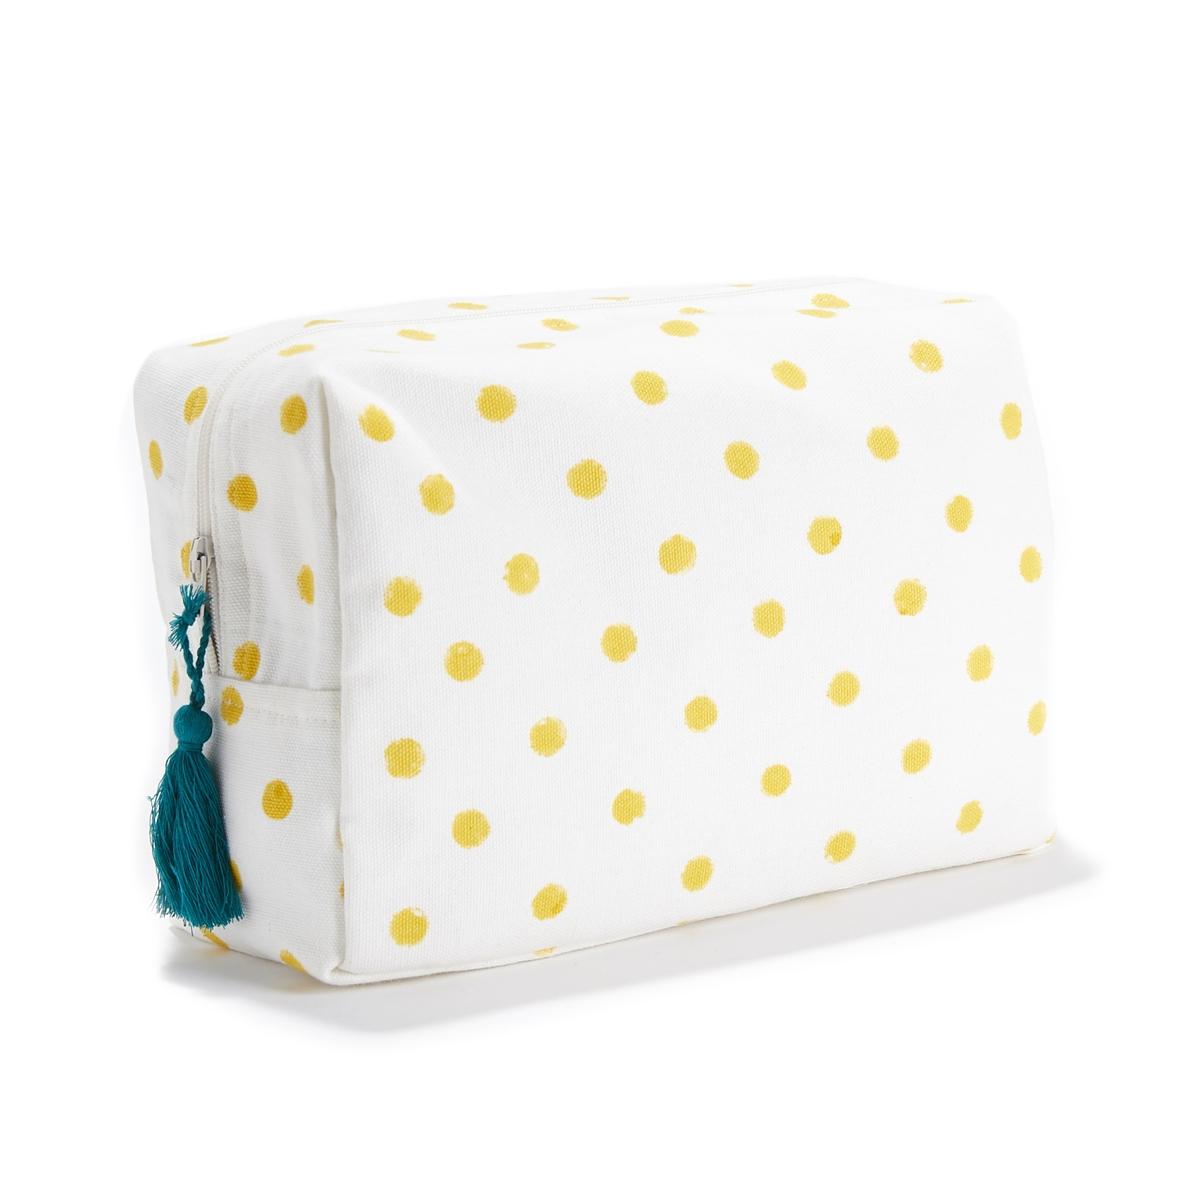 Косметичка в горошек DOTS women travel cosmetic polka dots makeup double layer case pouch organizer bag